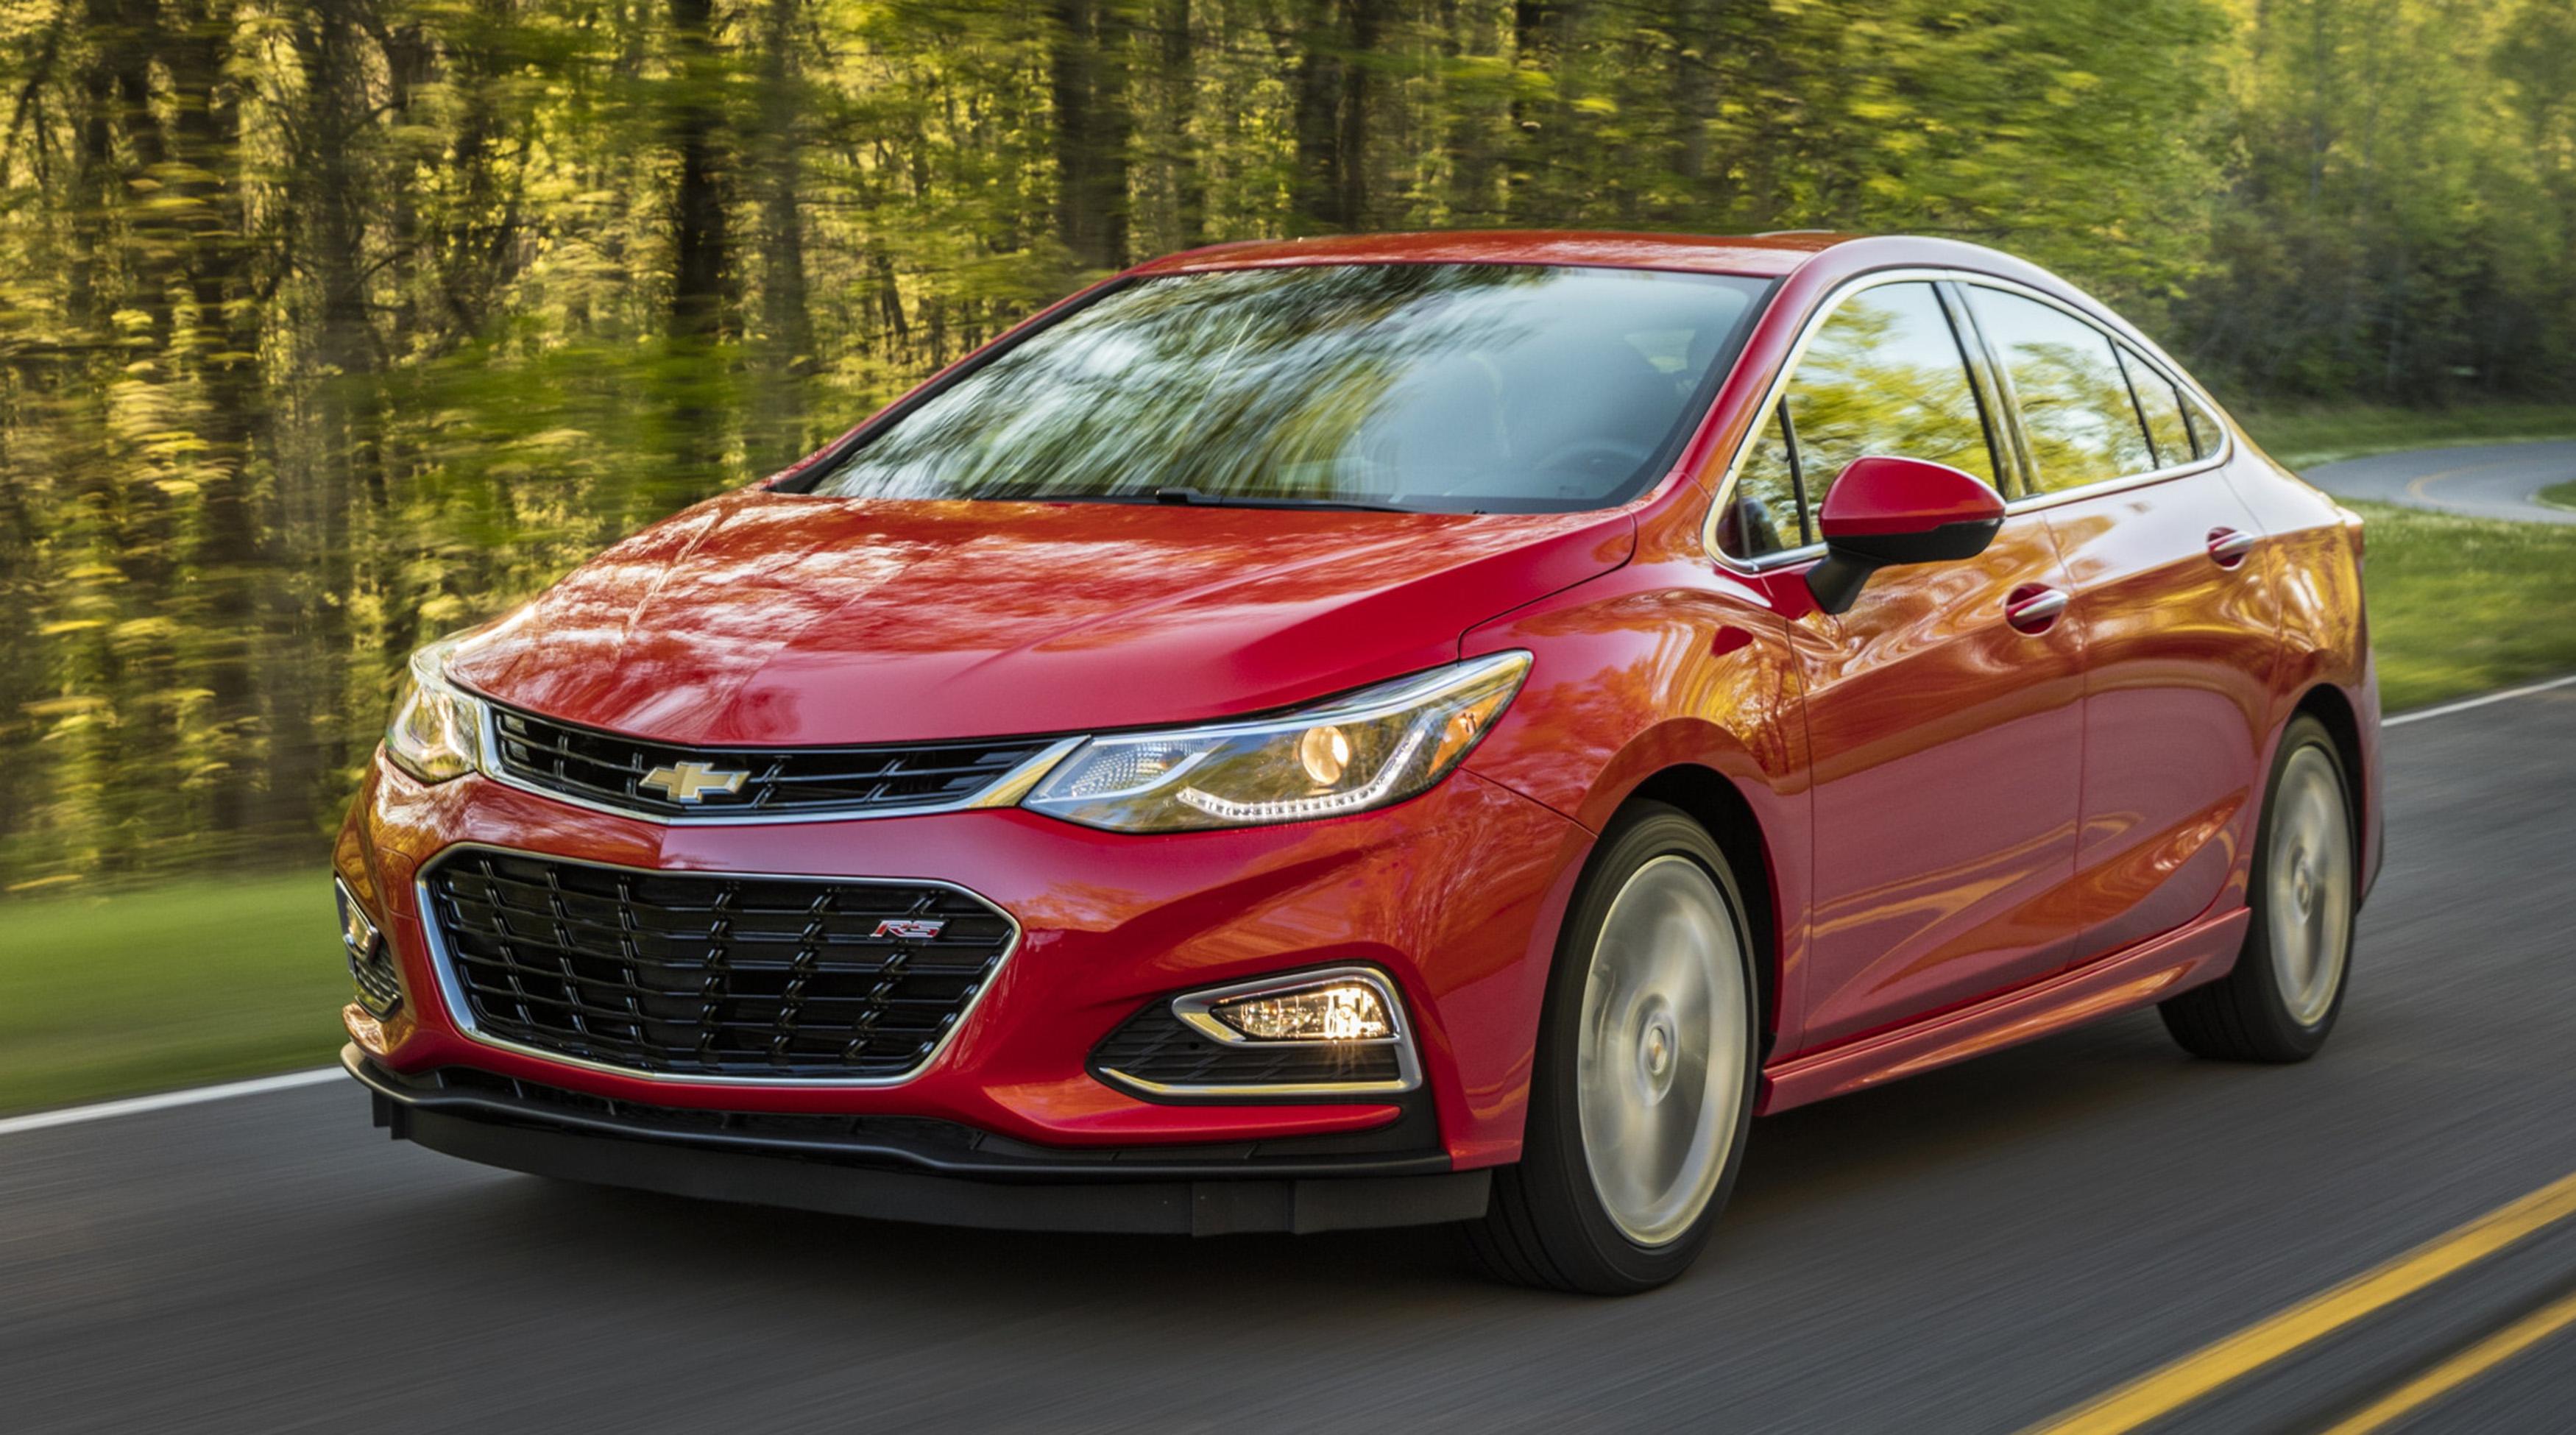 2016-Chevrolet-Cruze-043.jpg